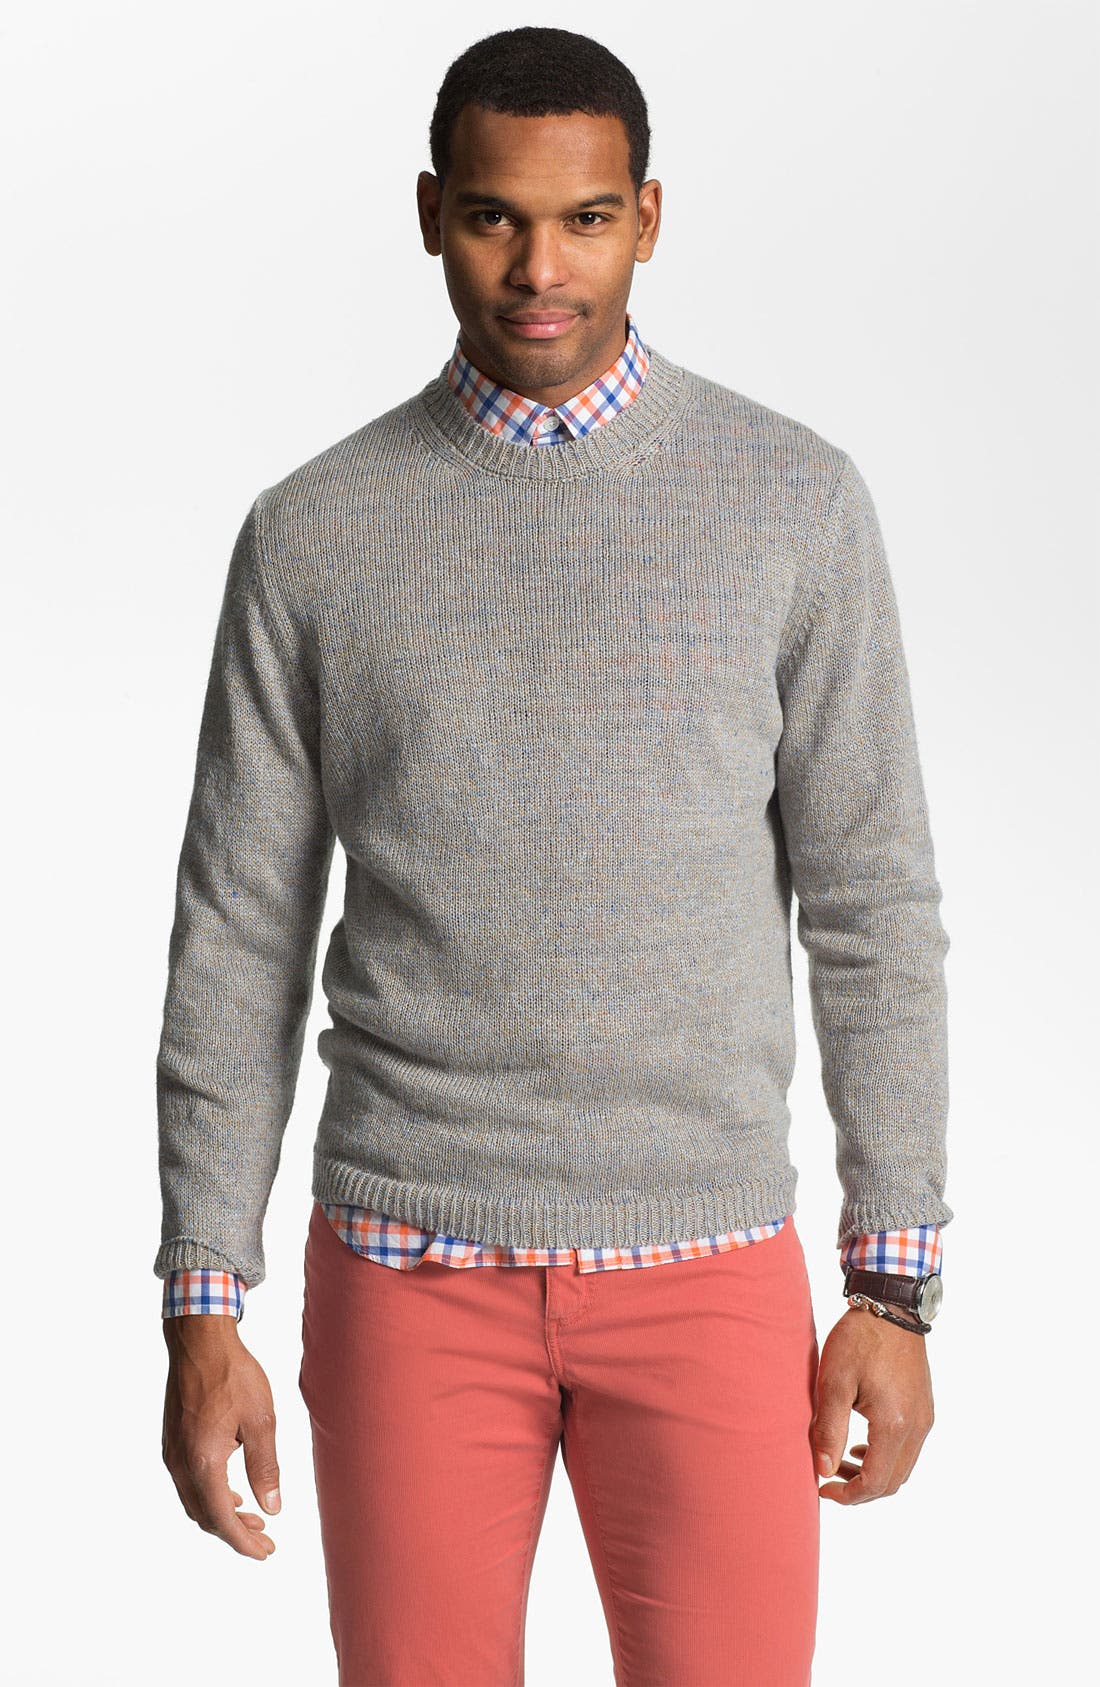 Main Image - Hickey Freeman 'Beach' Linen Blend Sweater